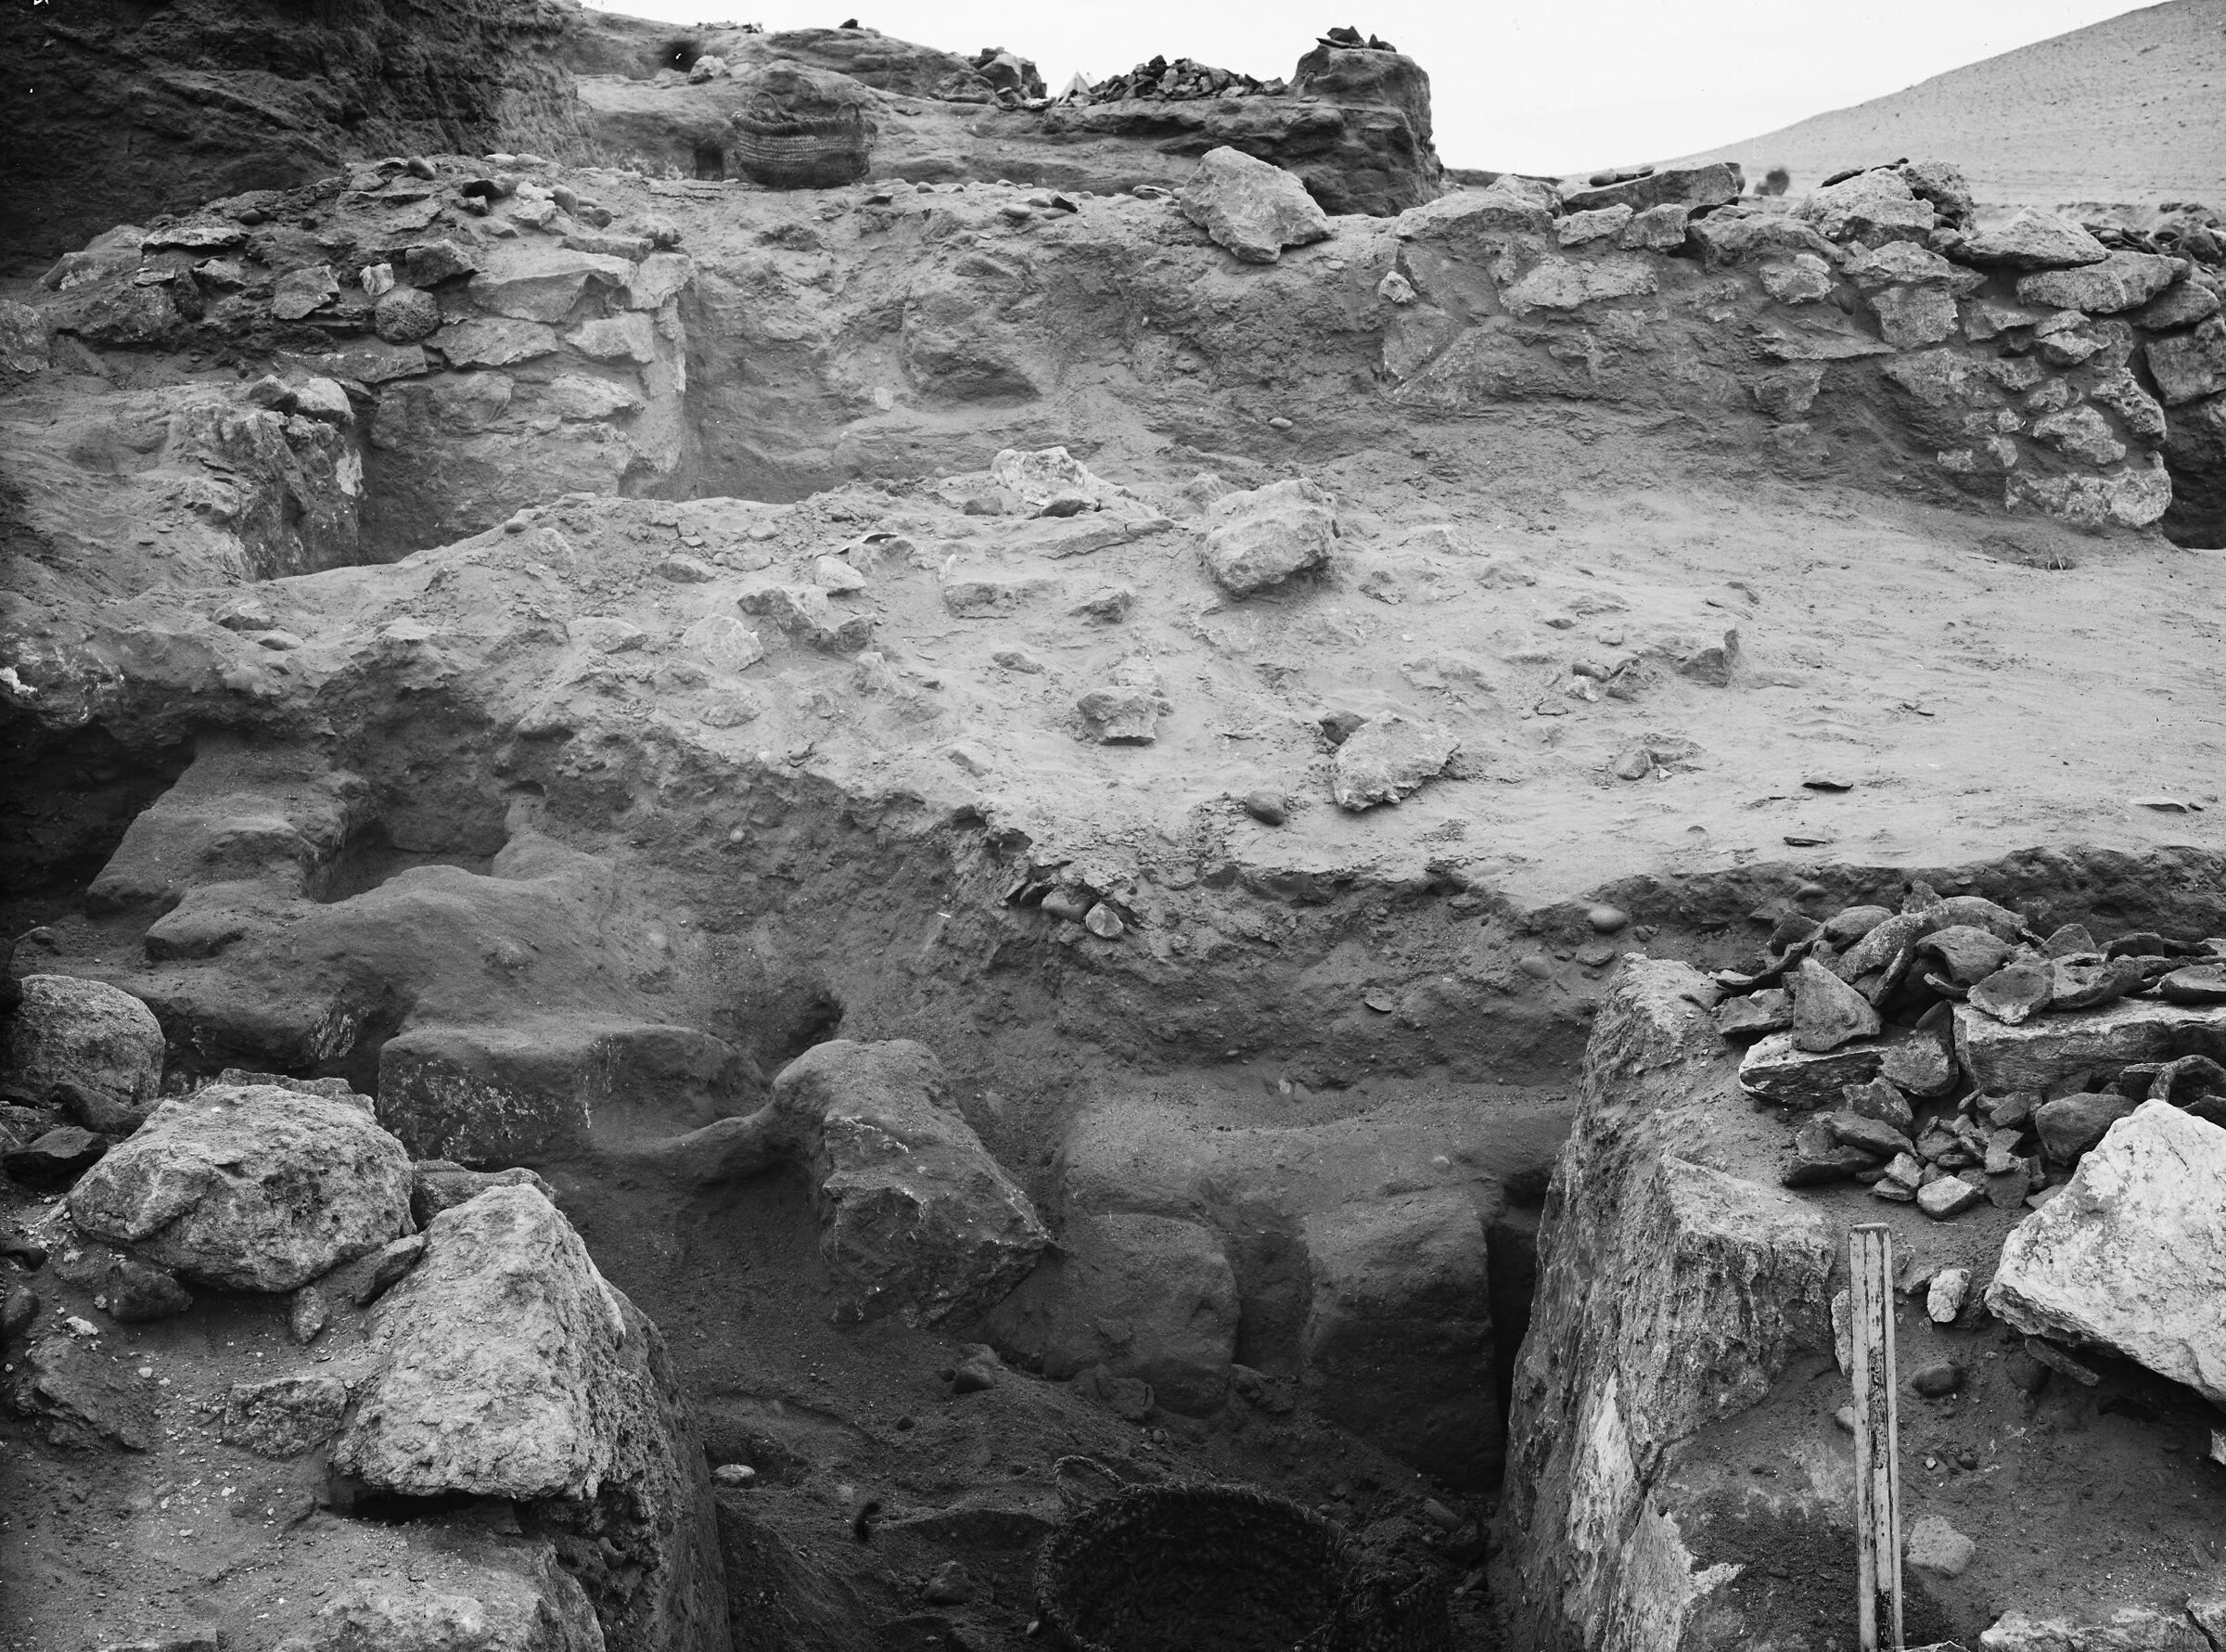 Wadi Cemetery (Reisner; north of W. Cem): Site: Giza; View: GW 6, GW 7, GW 12